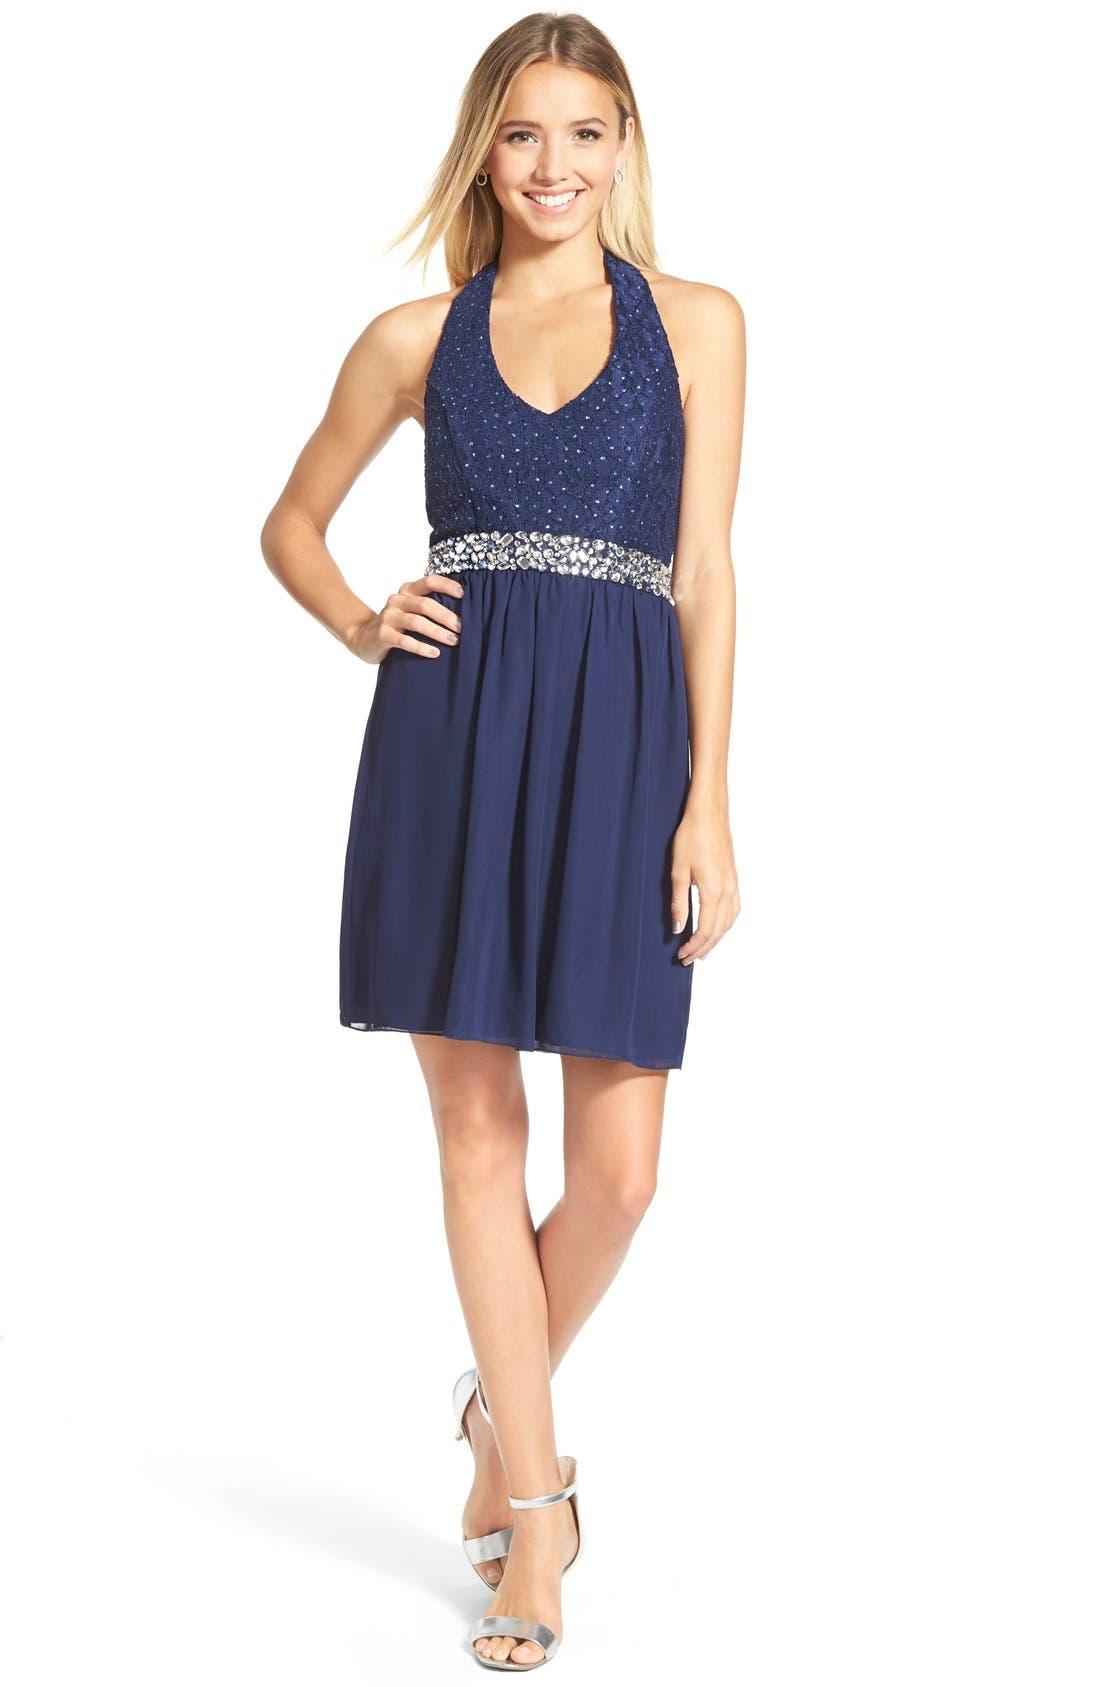 Main Image - Speechless Bow Back Lace Halter Dress